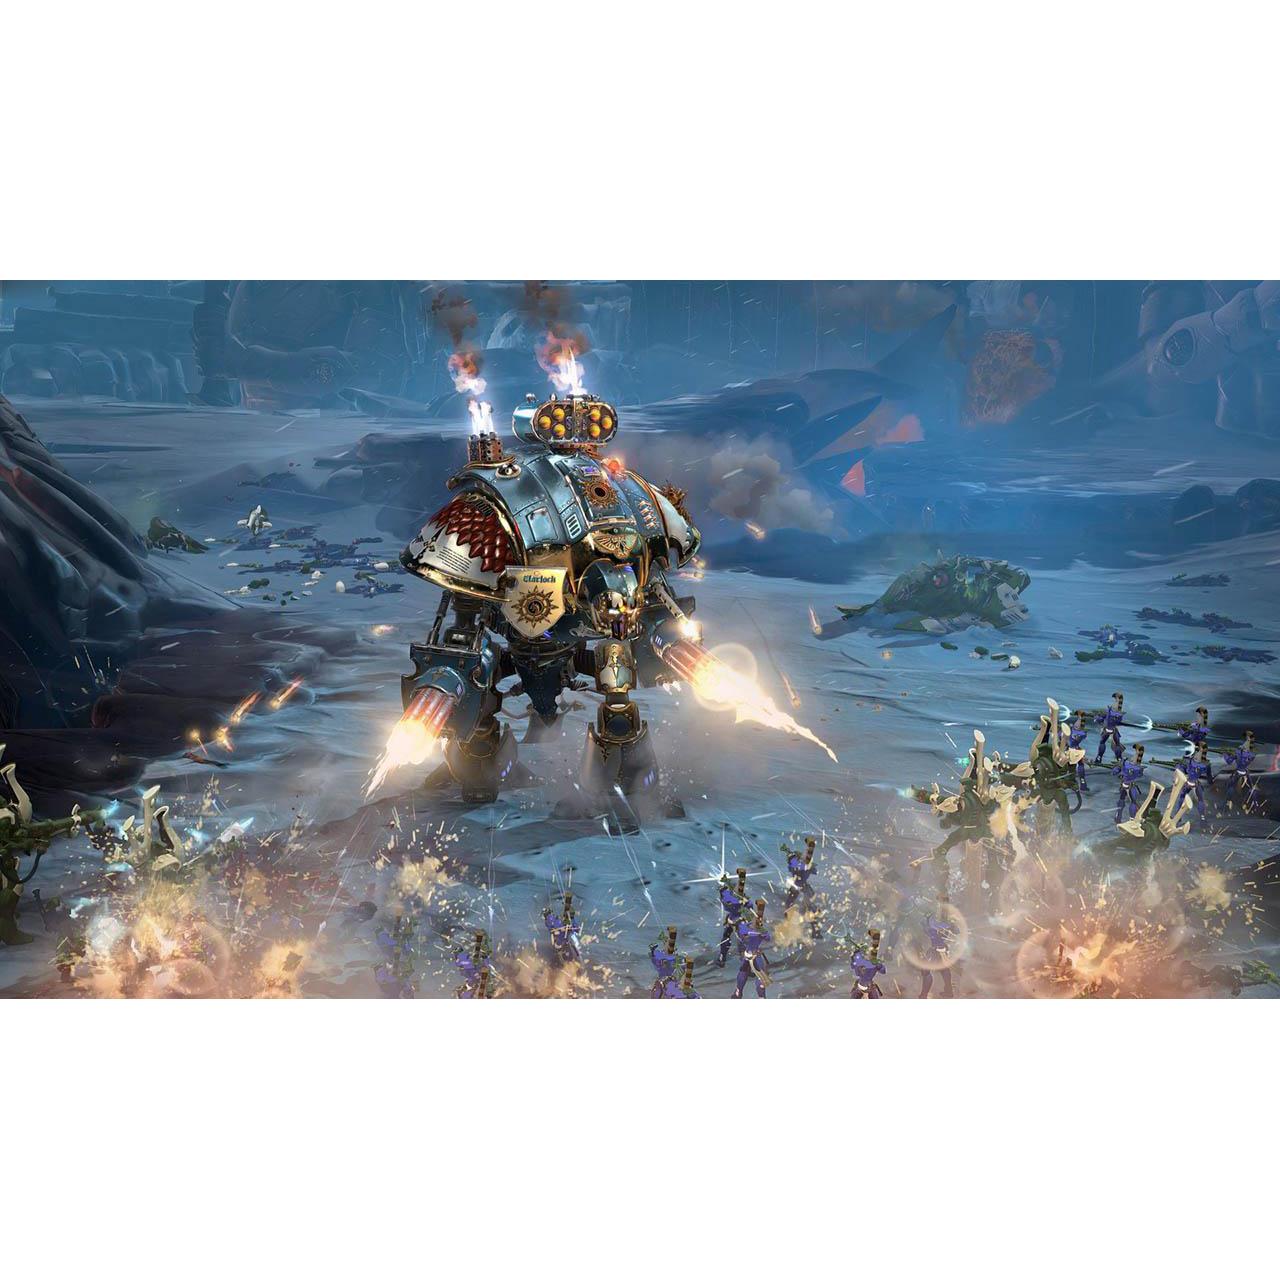 Joc Dawn of War 3 pentru PC 2